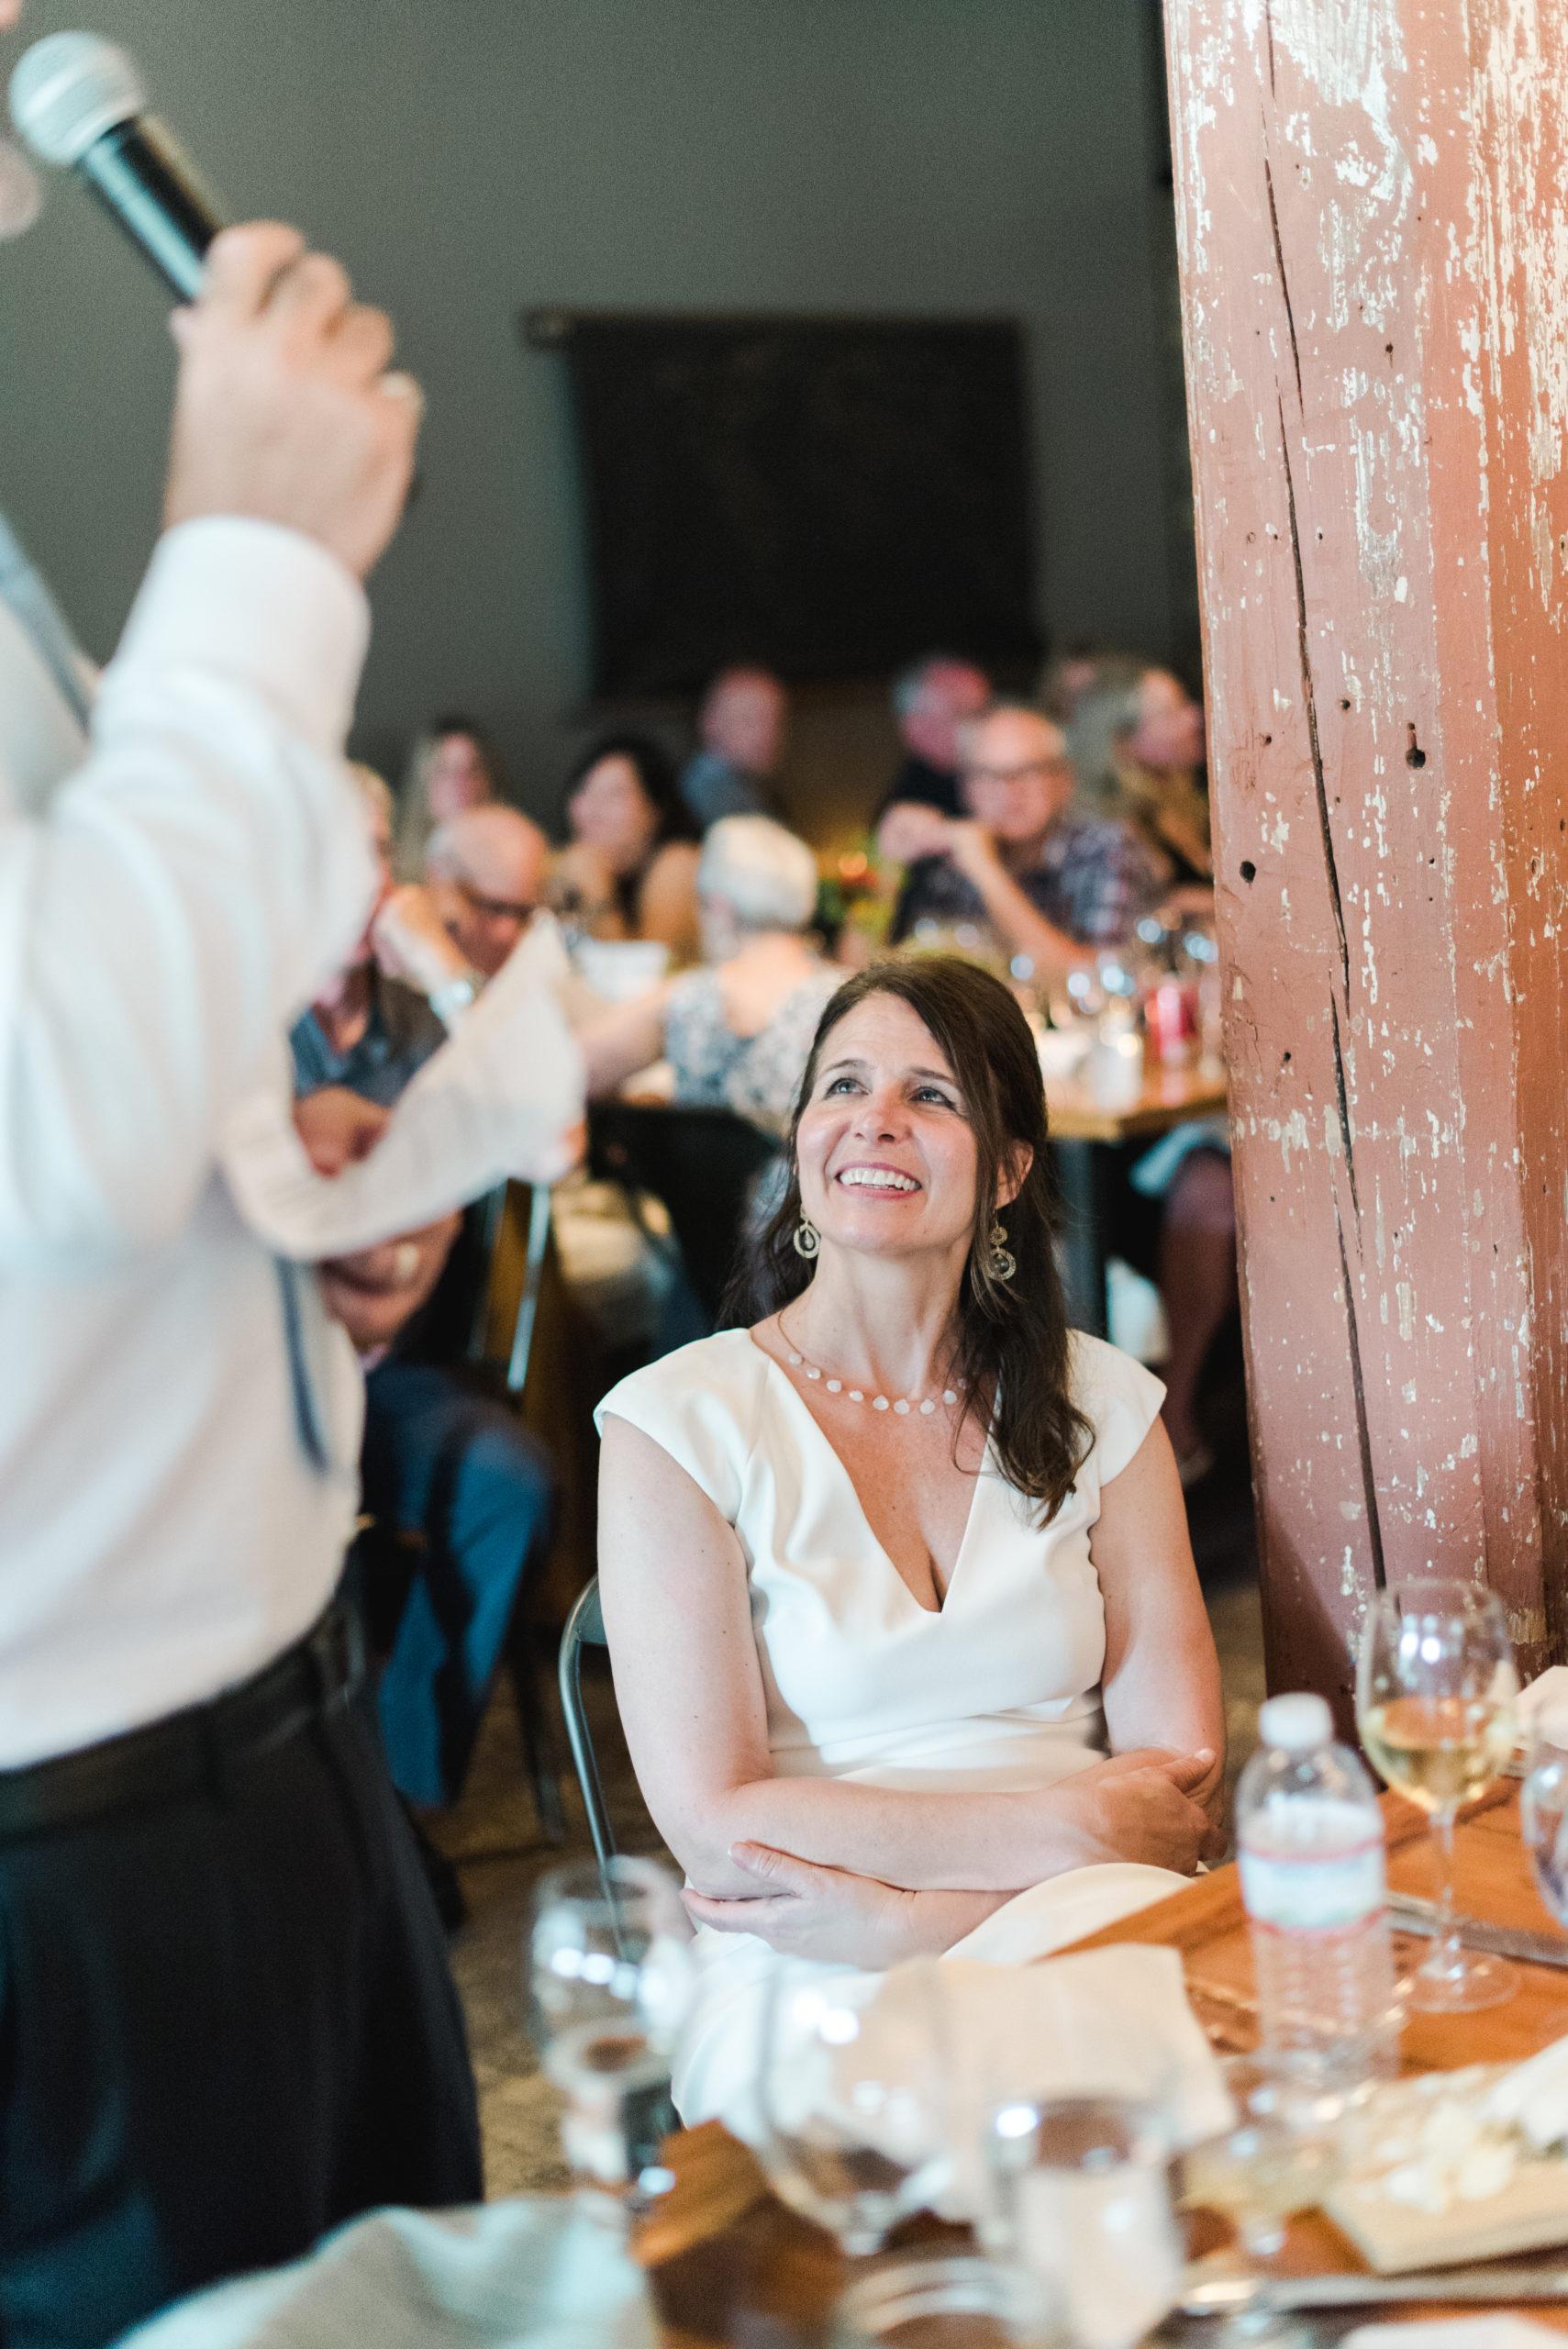 A groom giving a toast